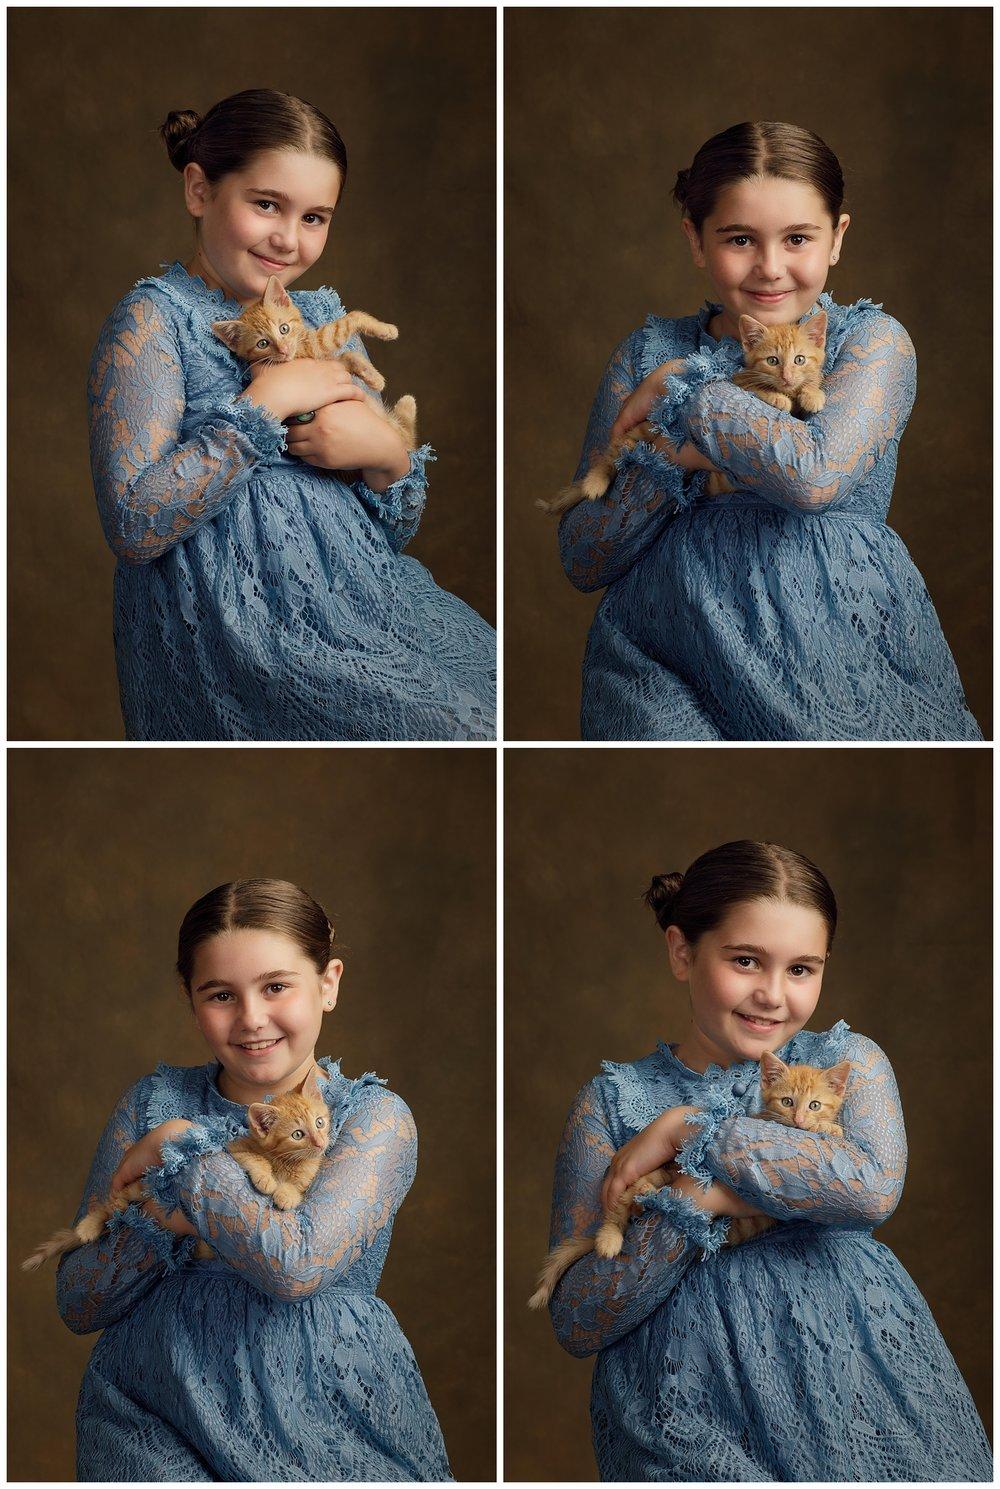 Studio photos of girl with cat in Charlestown, RI